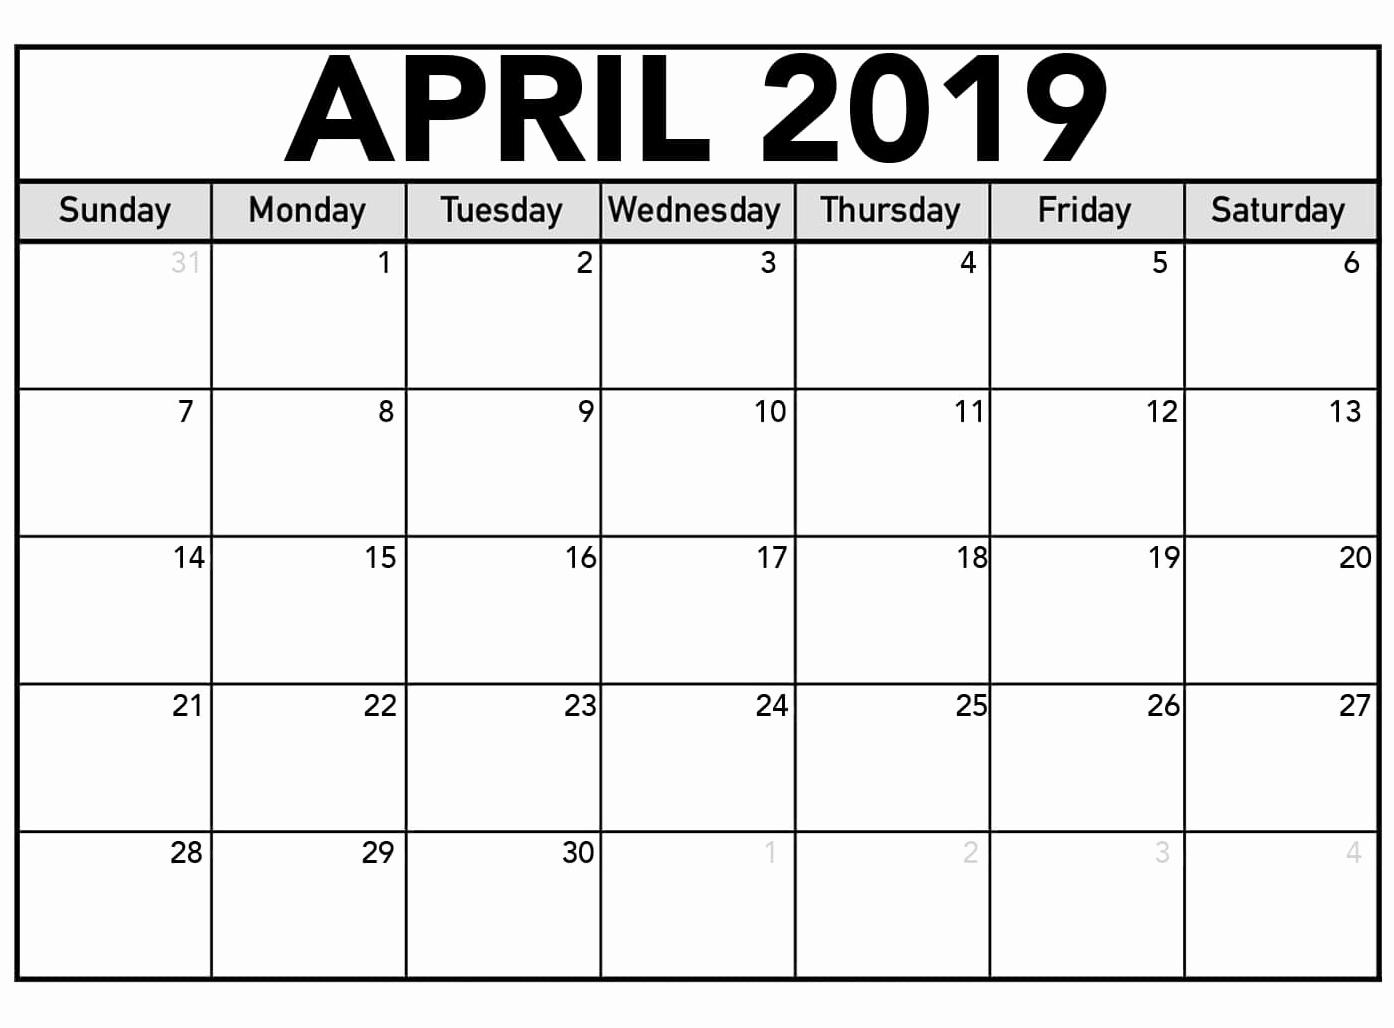 2019 Calendar Template Word Elegant Editable April 2019 Word Calendar Templates